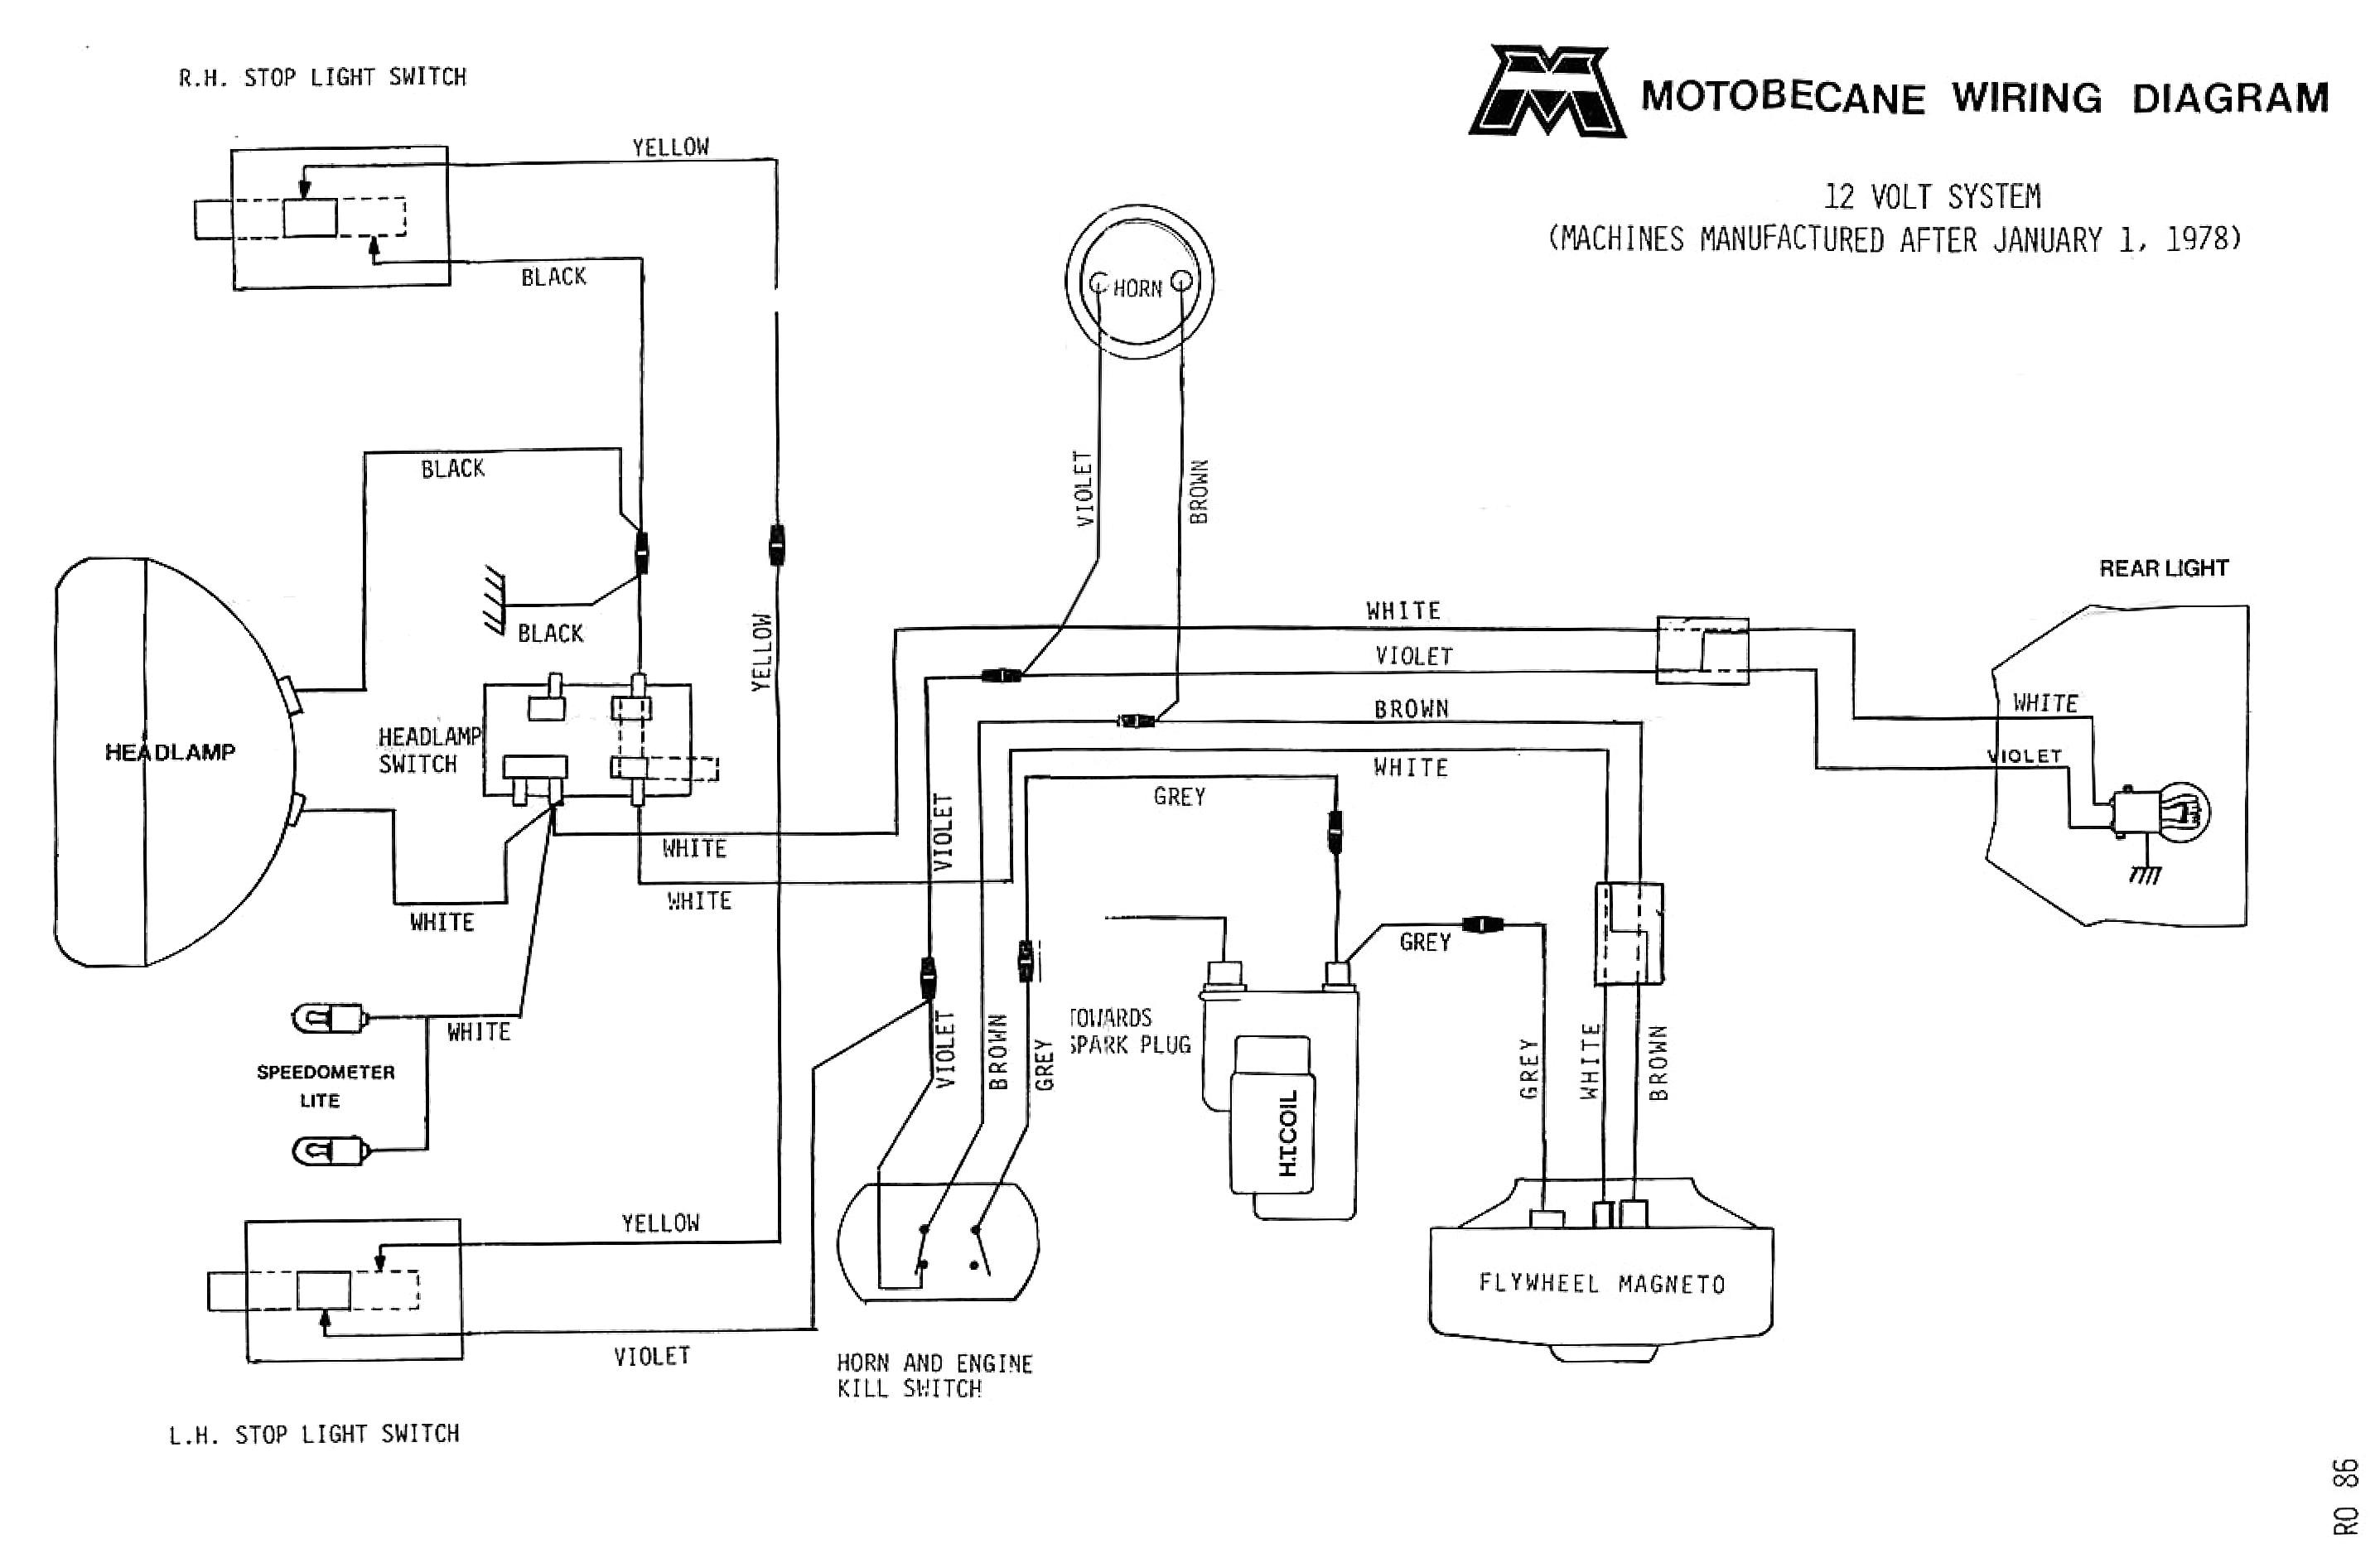 1951 8n wiring system diagram wiring diagrams new wiring diagram worksheet 1952 ford truck